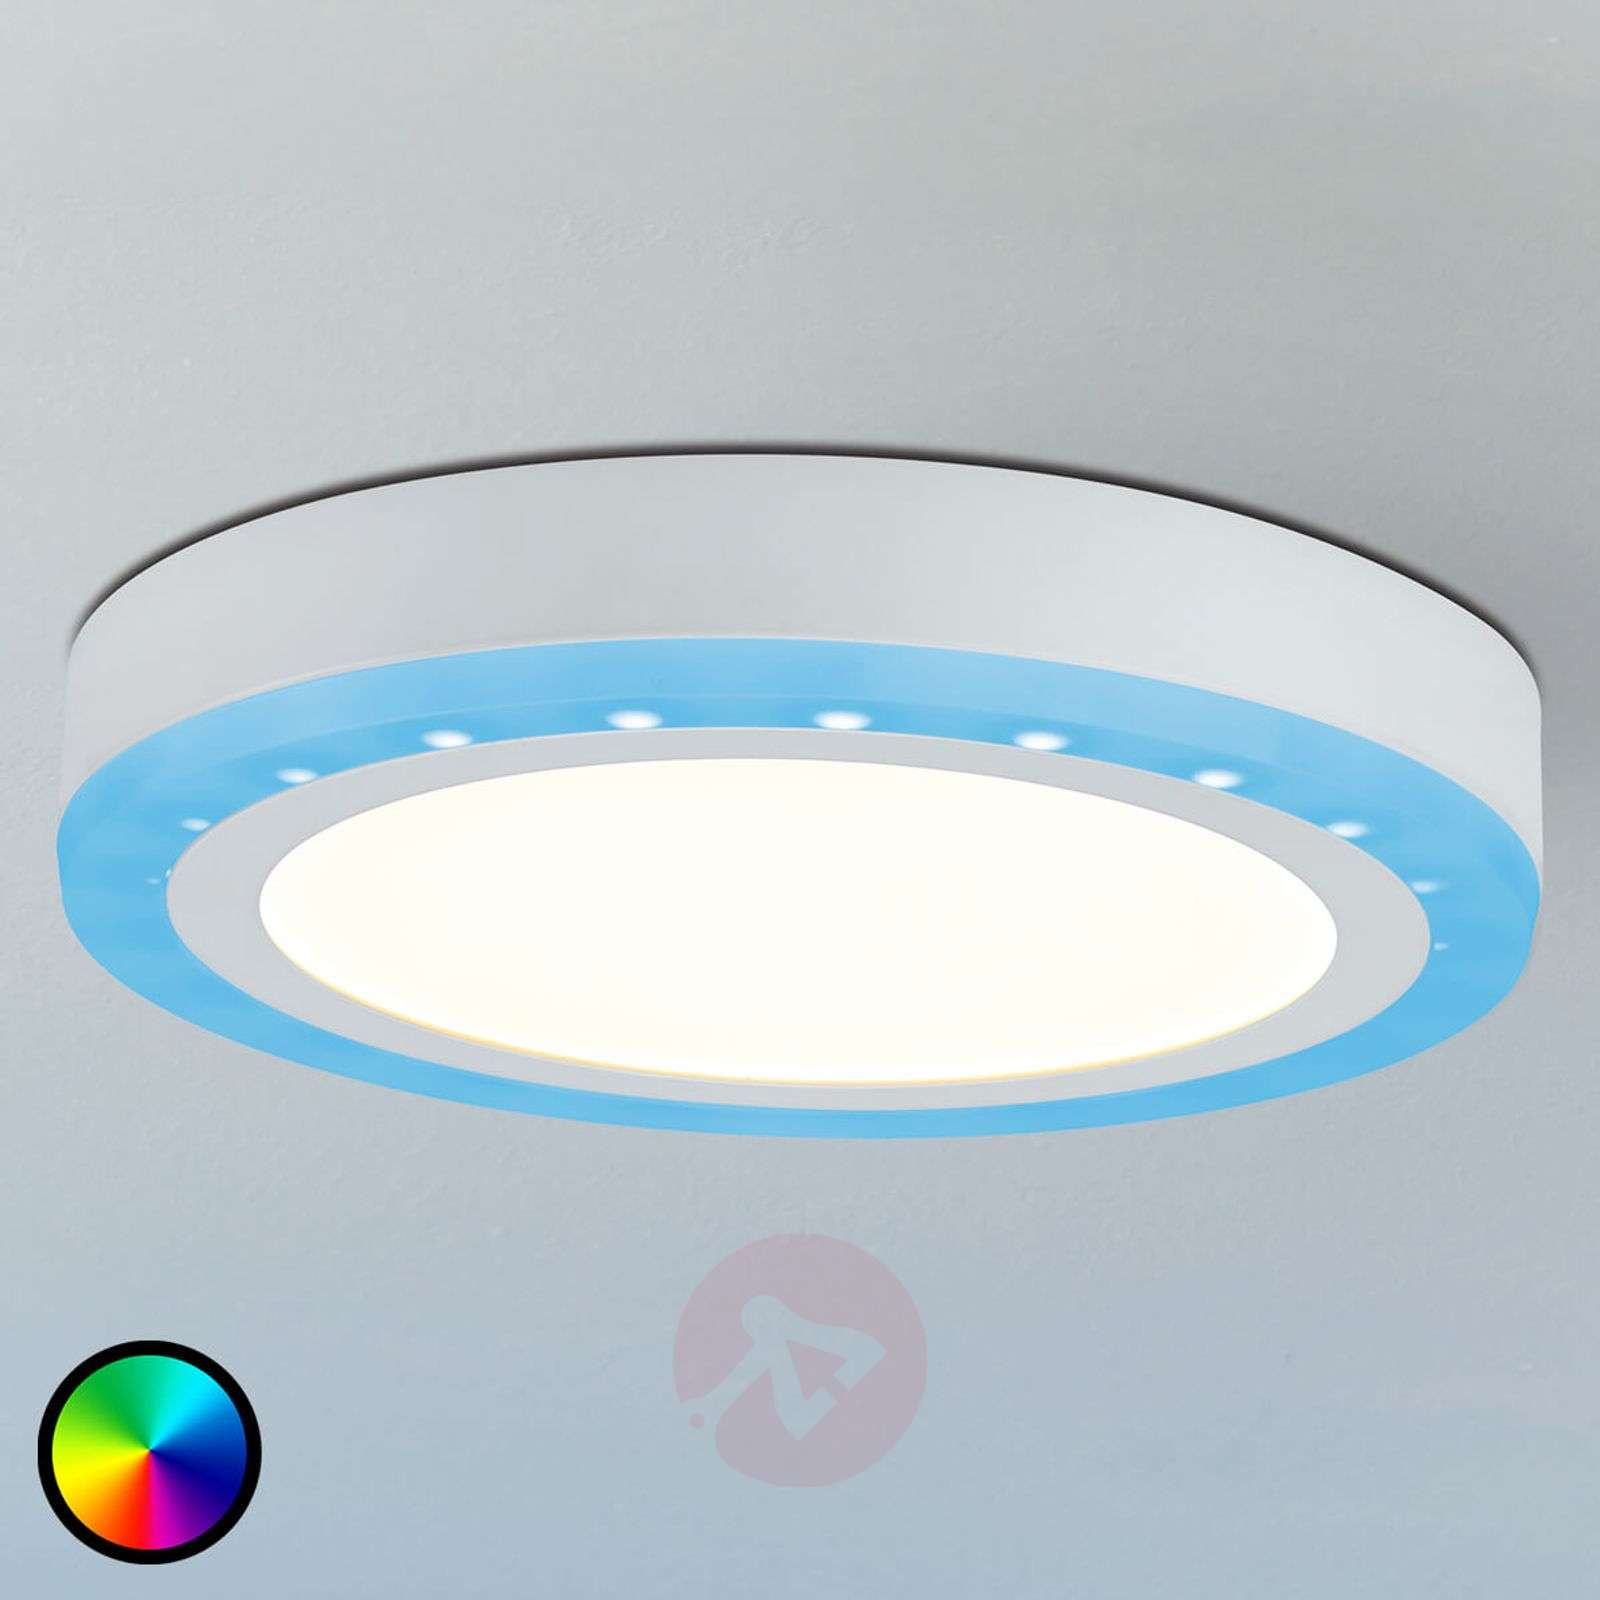 Colour Changing Led Ceiling Lights Pranksenders